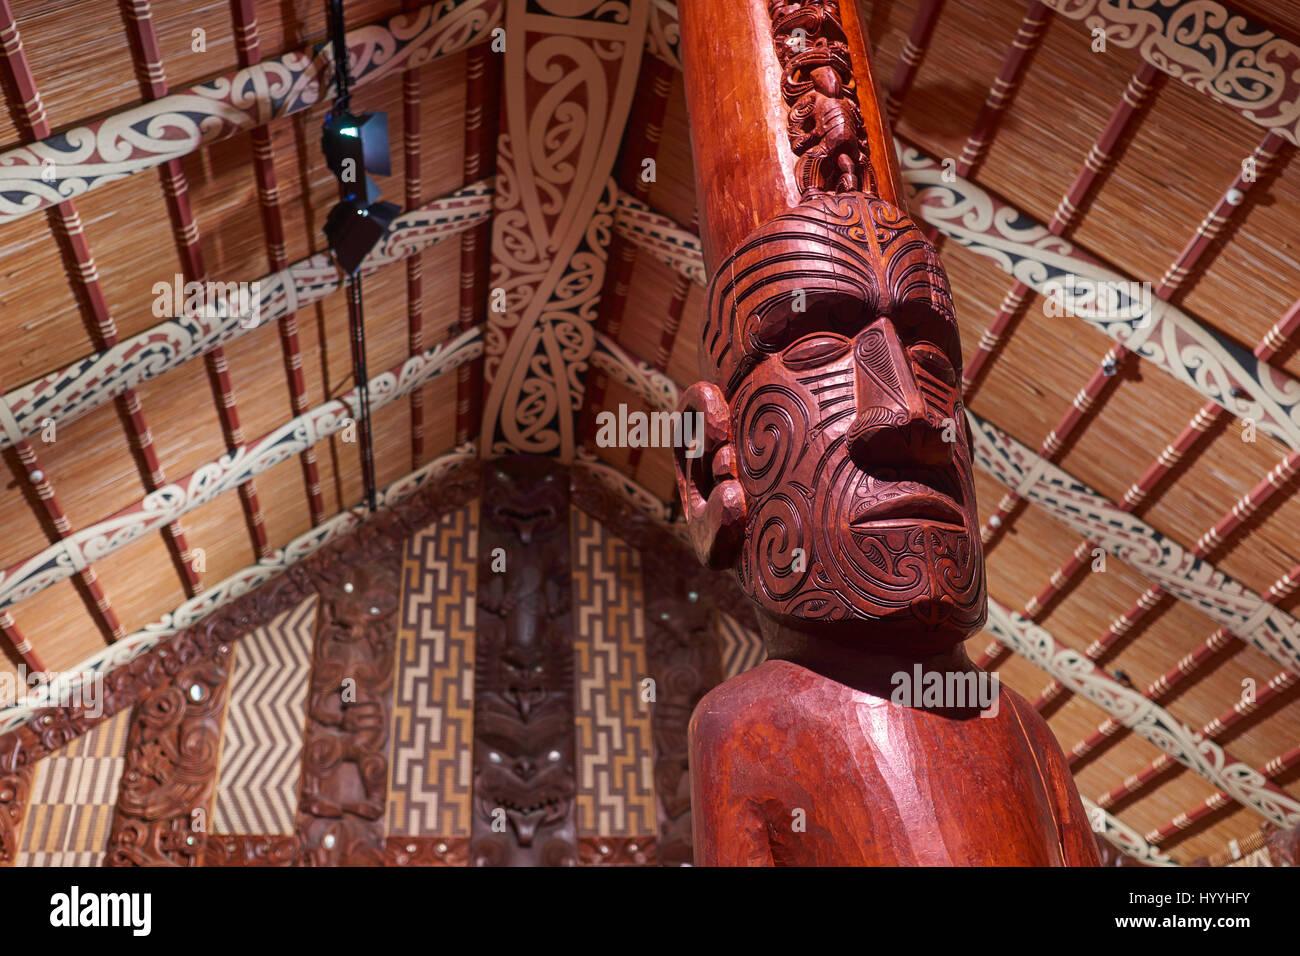 National Maori meeting house with carvings - Waitangi, Northland, New Zealand Stock Photo